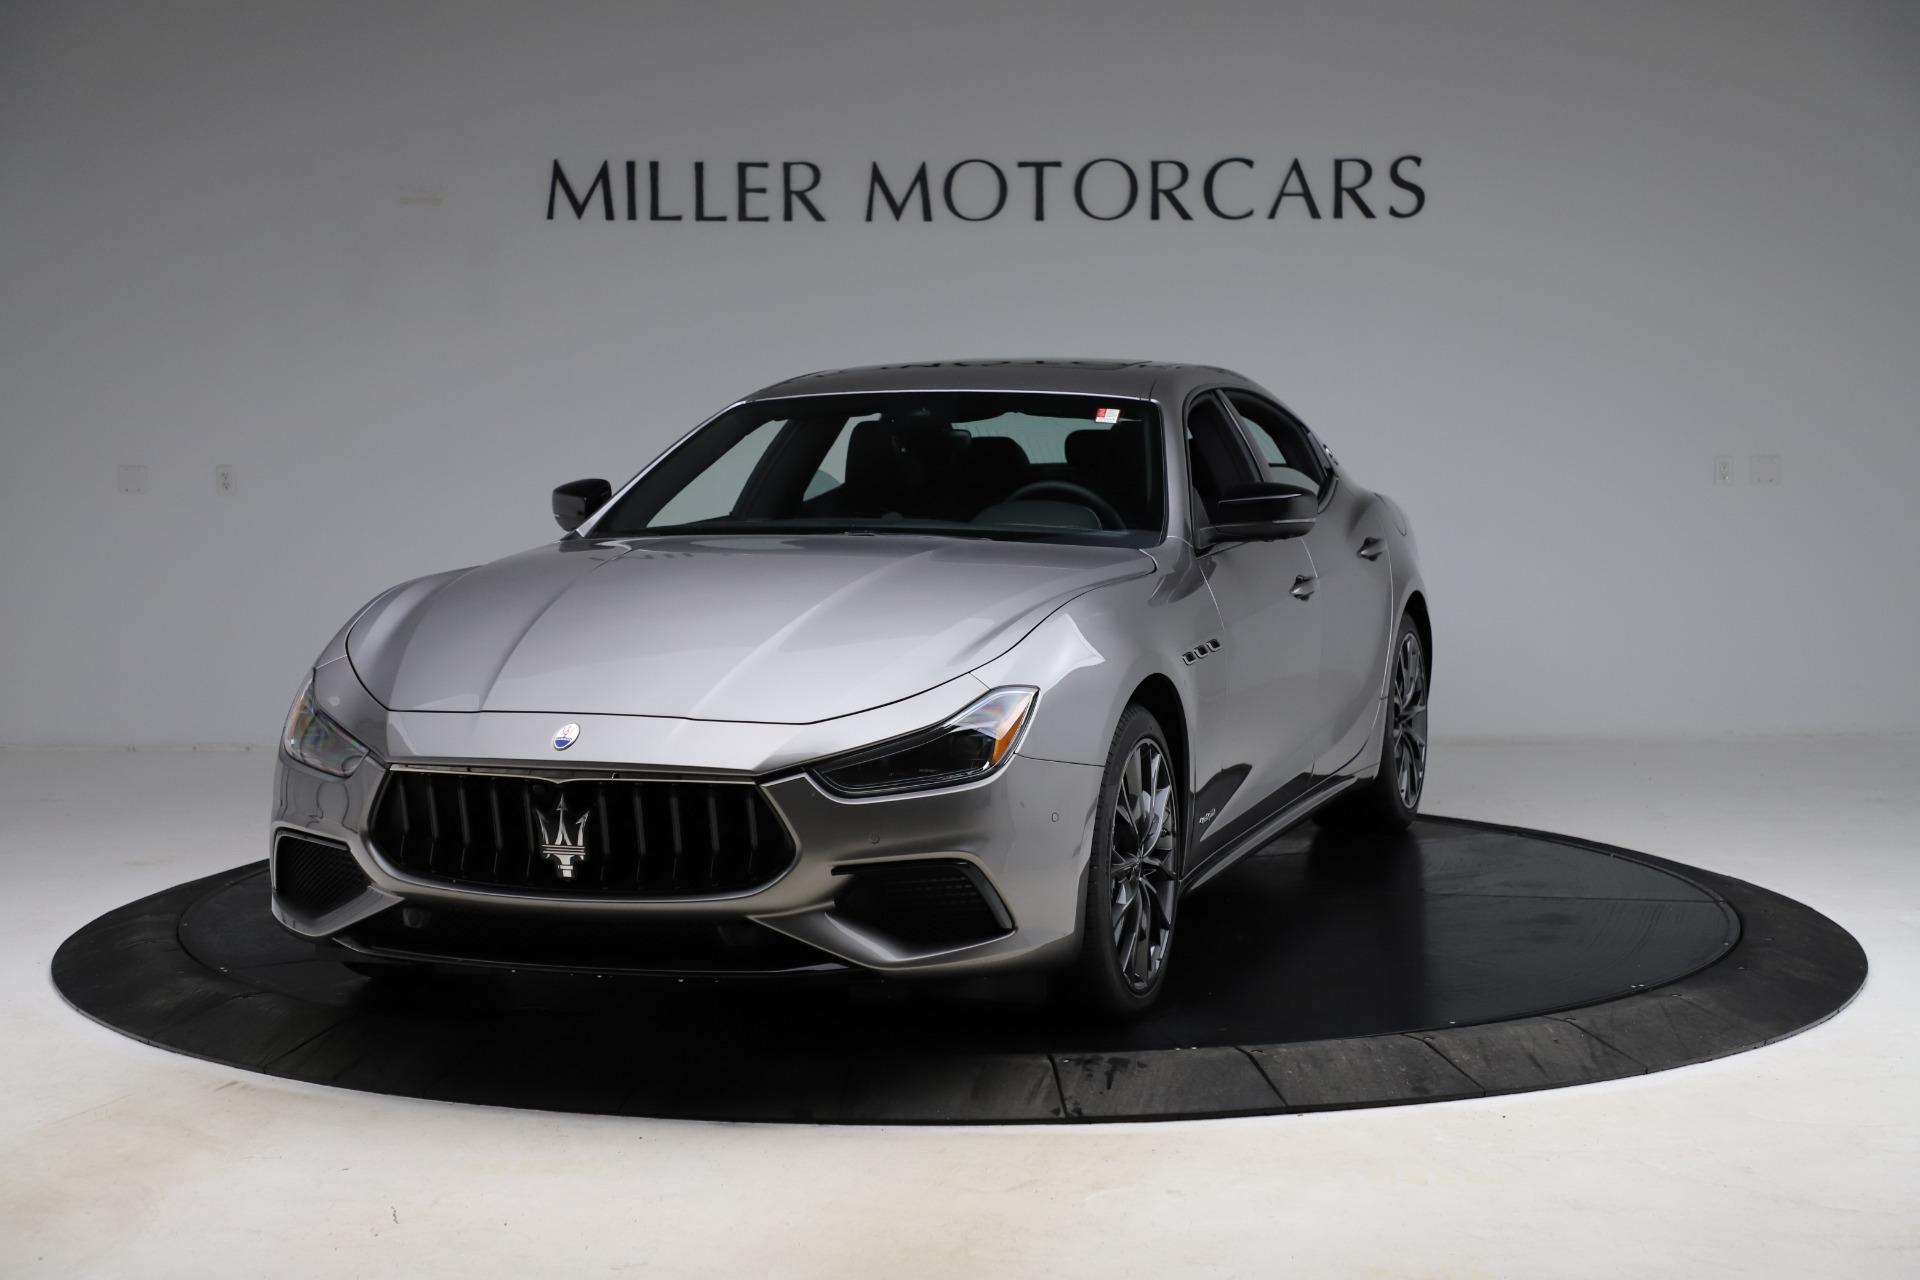 New 2021 Maserati Ghibli S Q4 GranSport for sale $98,125 at Bugatti of Greenwich in Greenwich CT 06830 1